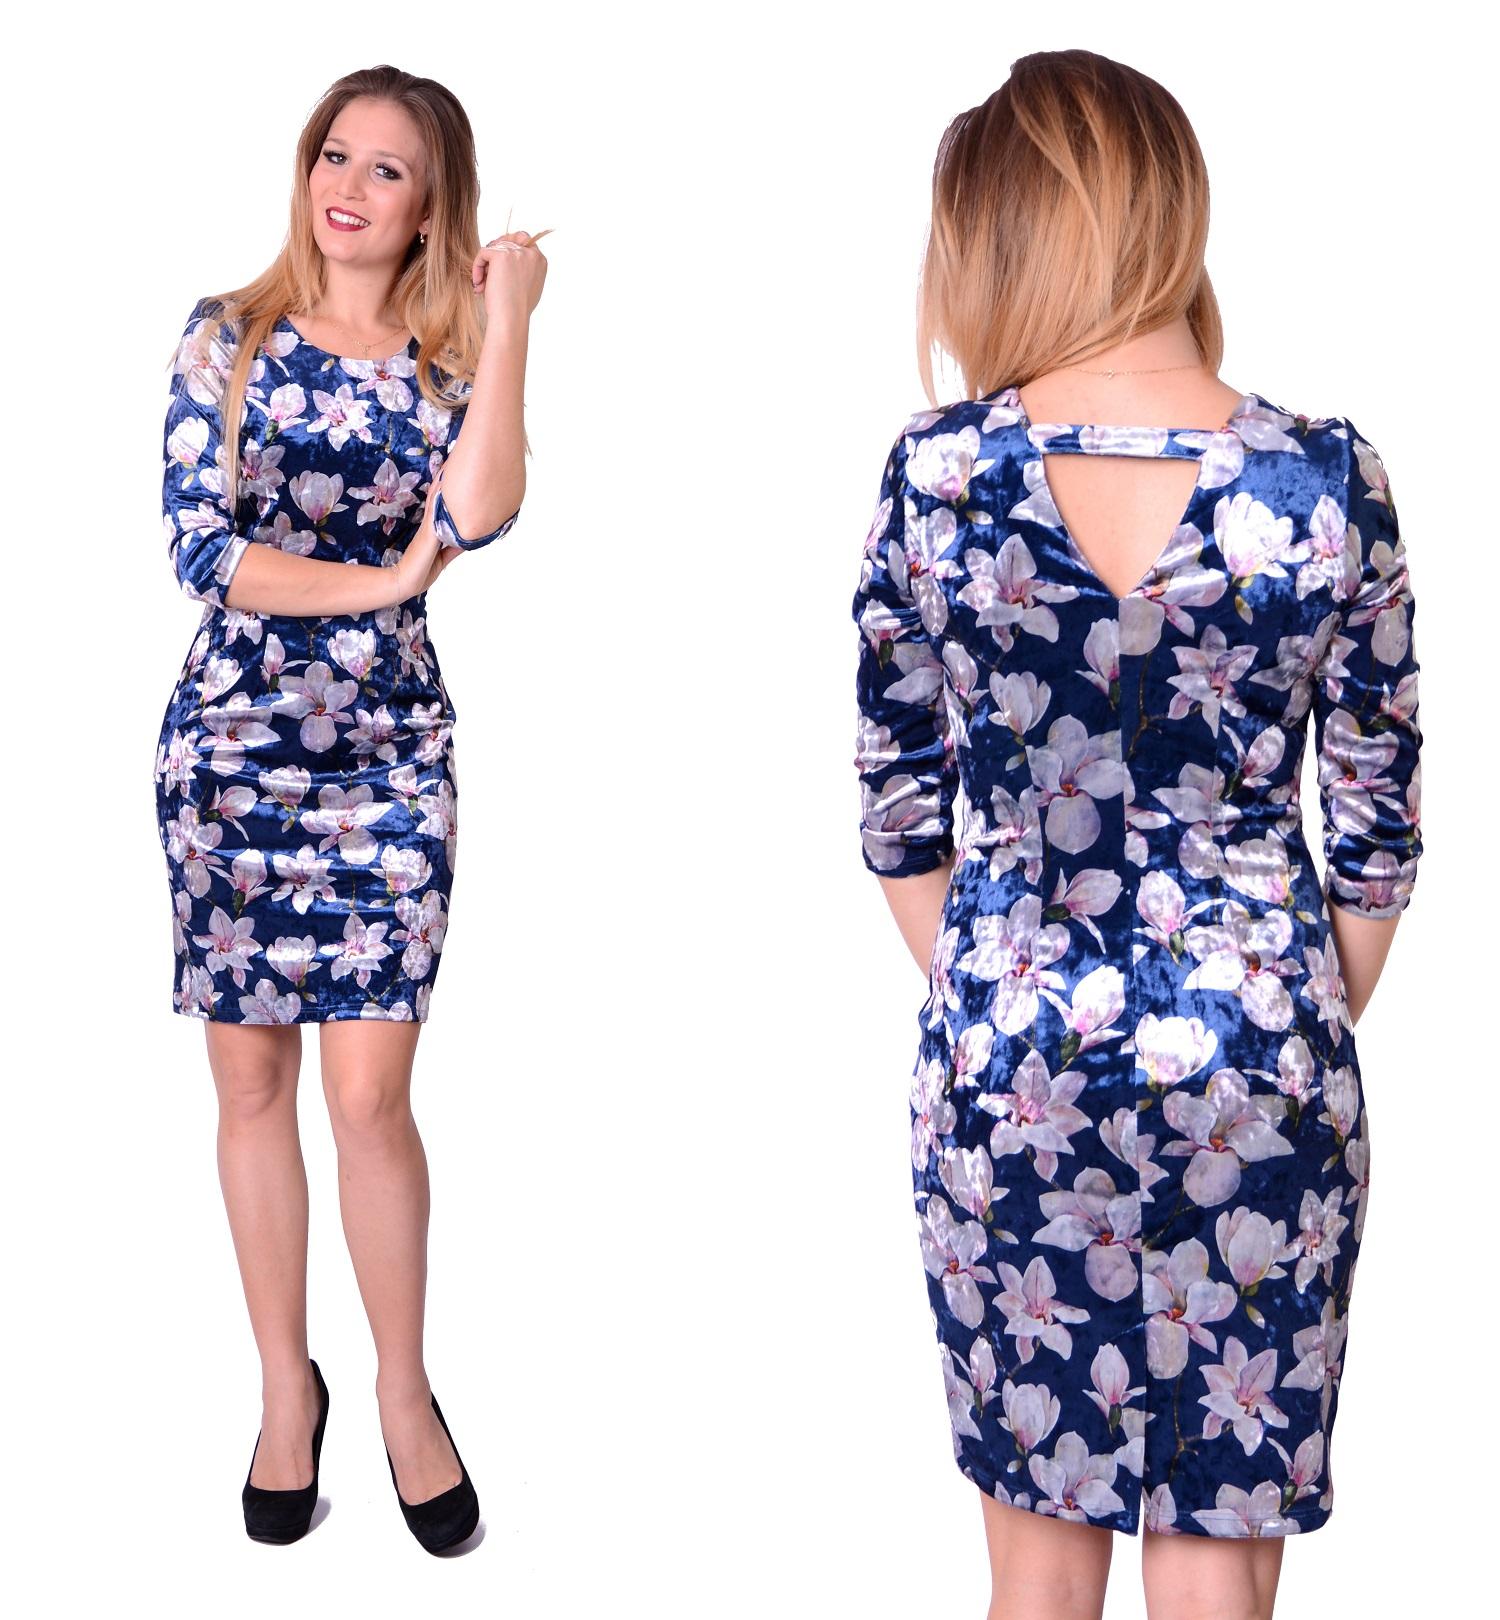 45e9e8b7a6 WYPRZEDAŻ Sukienka Welur Magnolie PRODUCENT roz.38 - 7107385805 ...